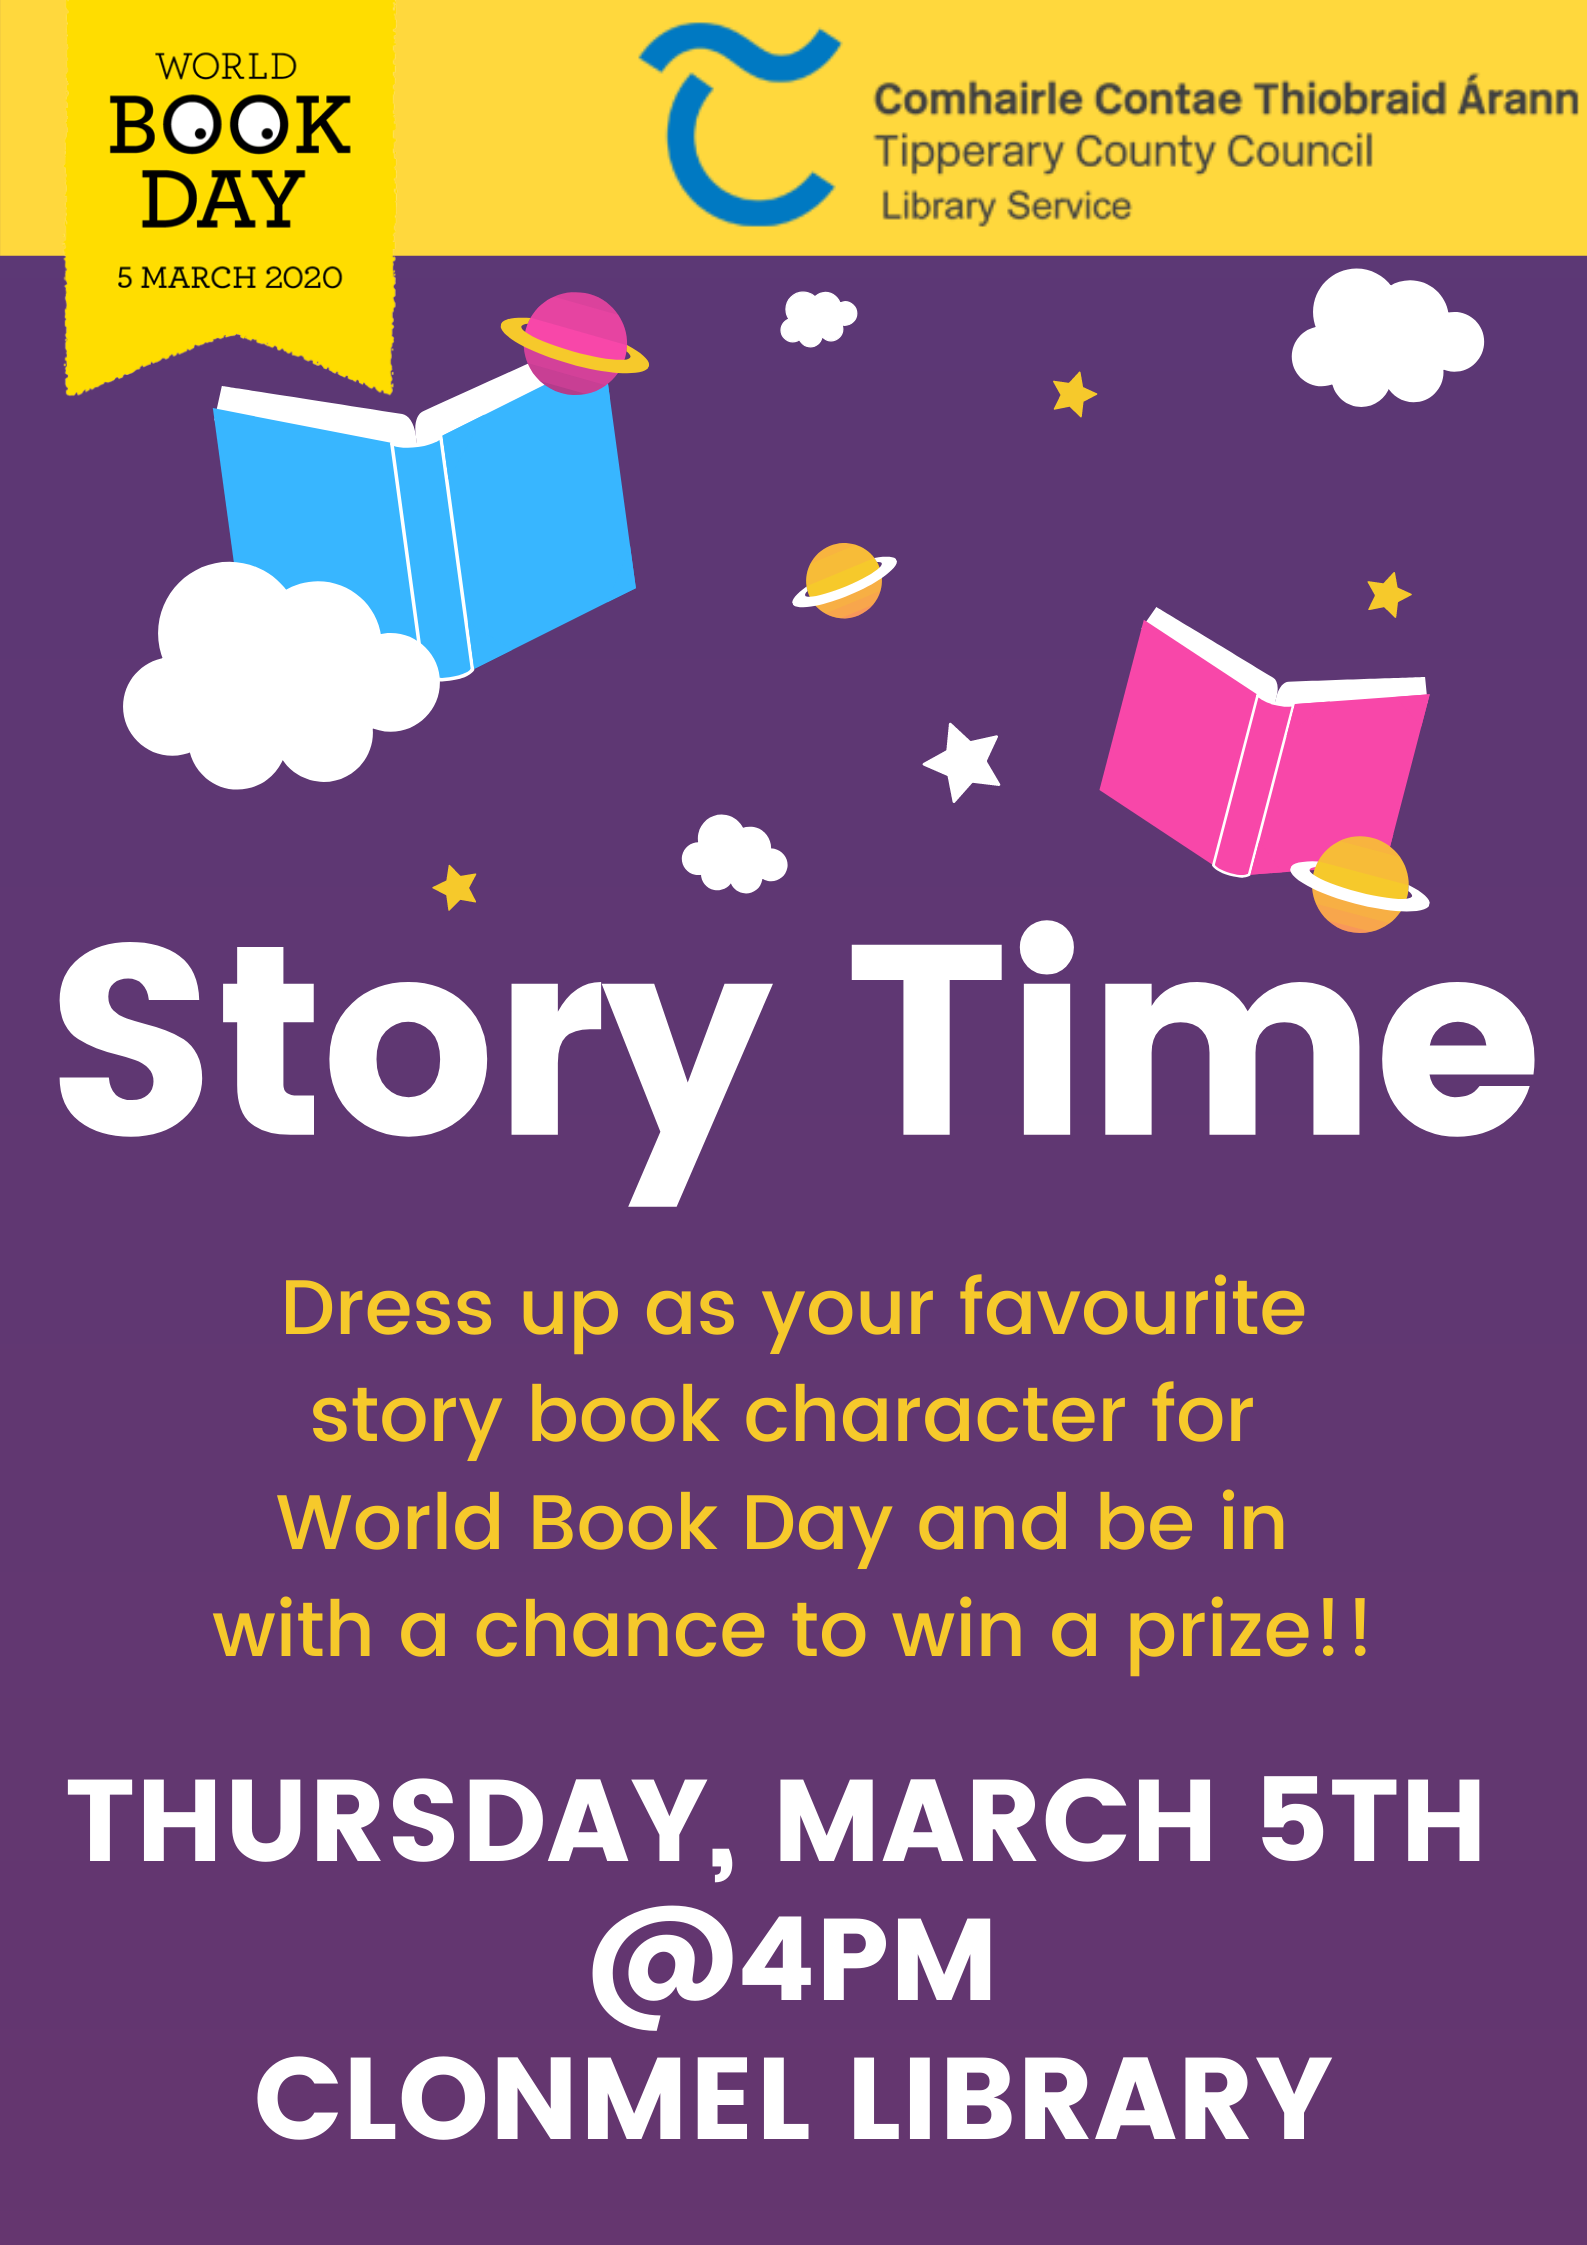 Clonmel Library: World Book Day